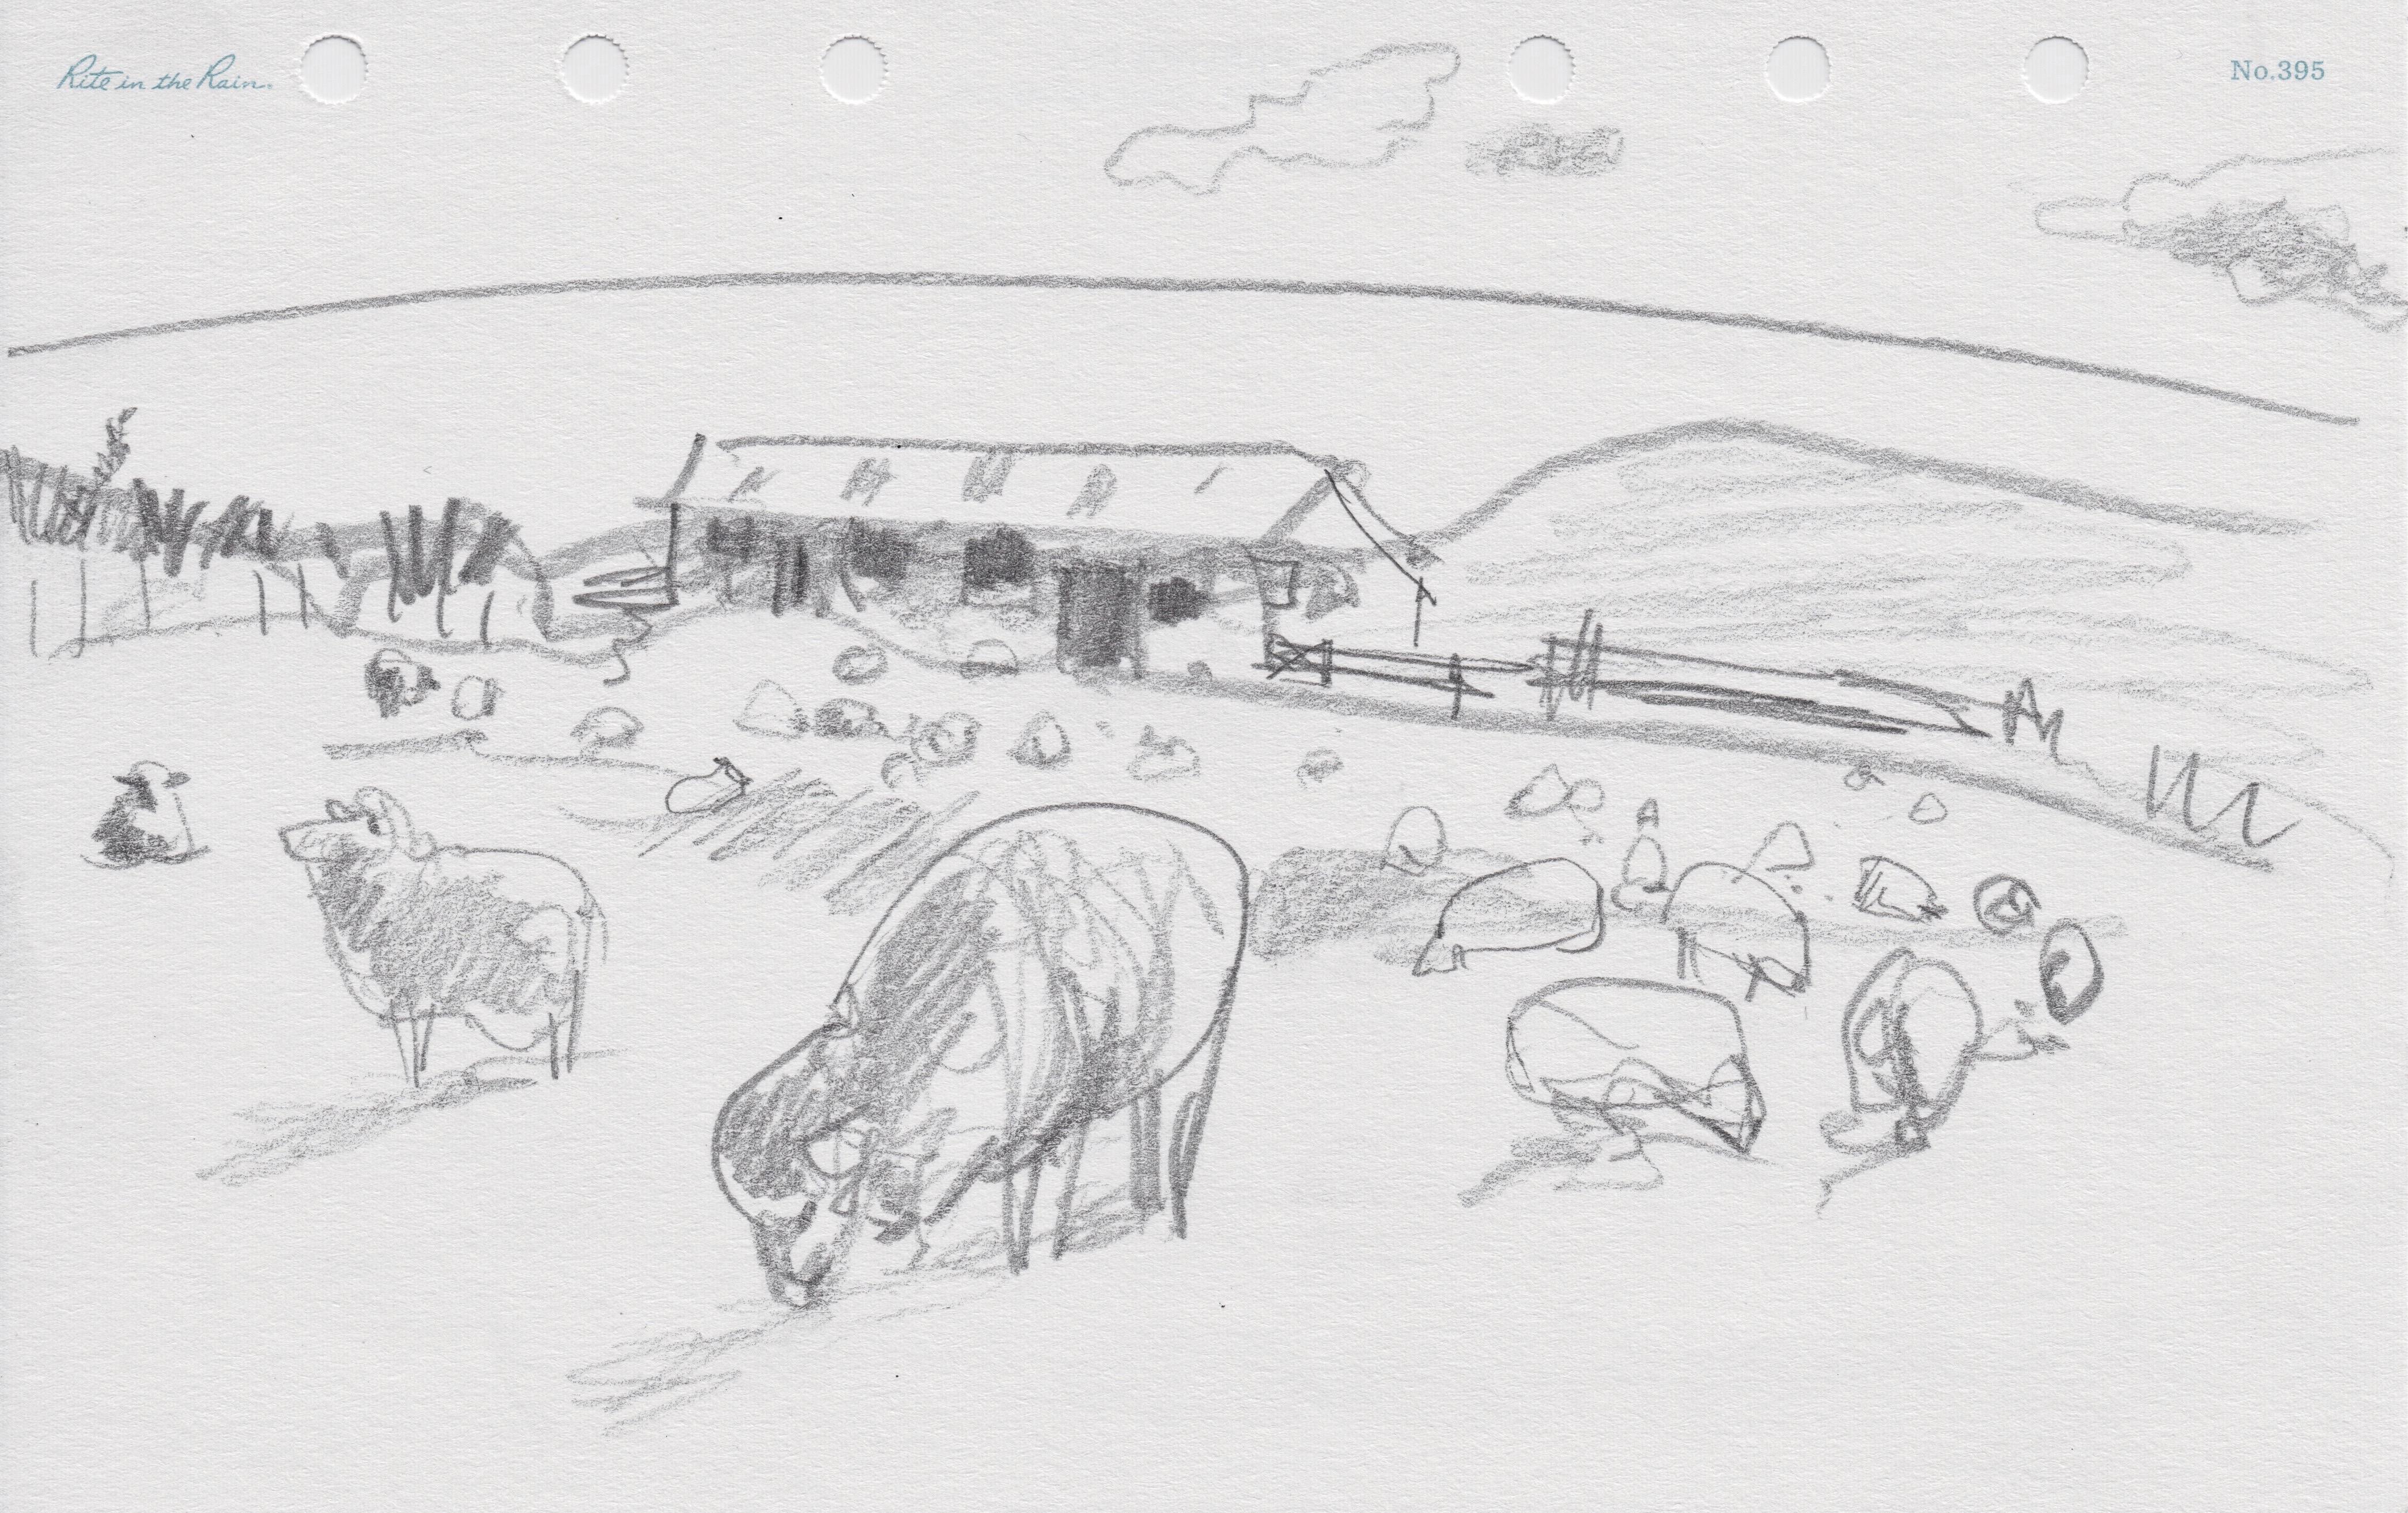 Sketches from Seabirdland - Open Explorer